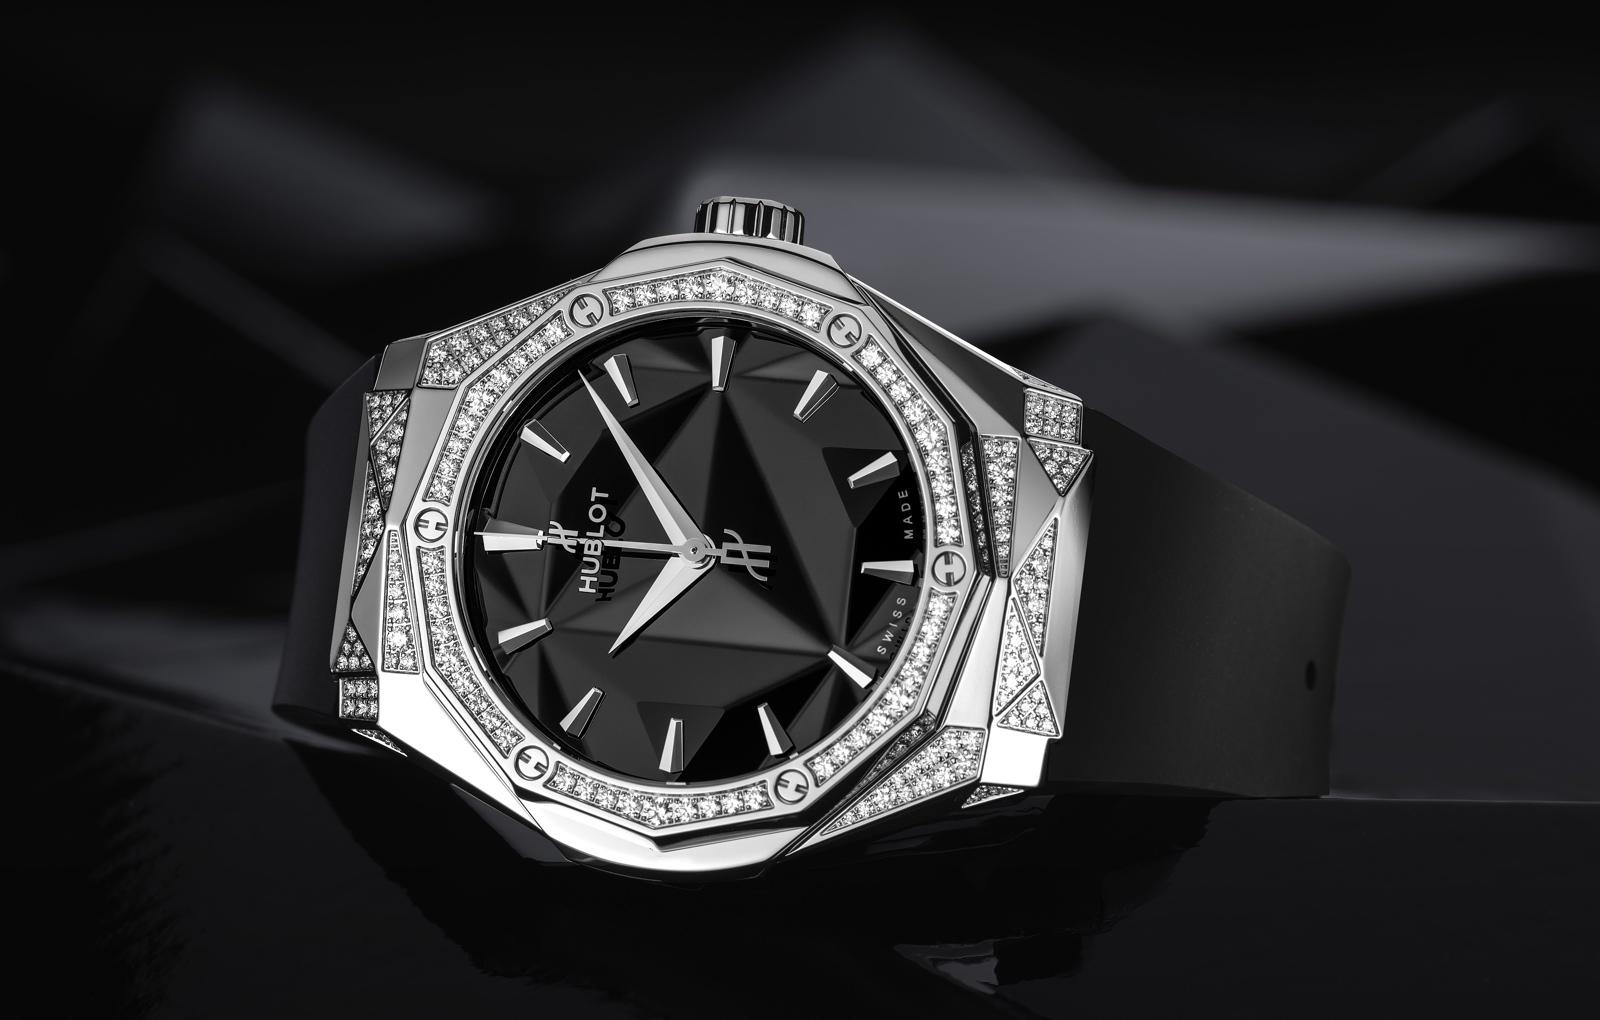 Hublot en Baselworld 2019 - Classic Fusion Orlinski diamonds